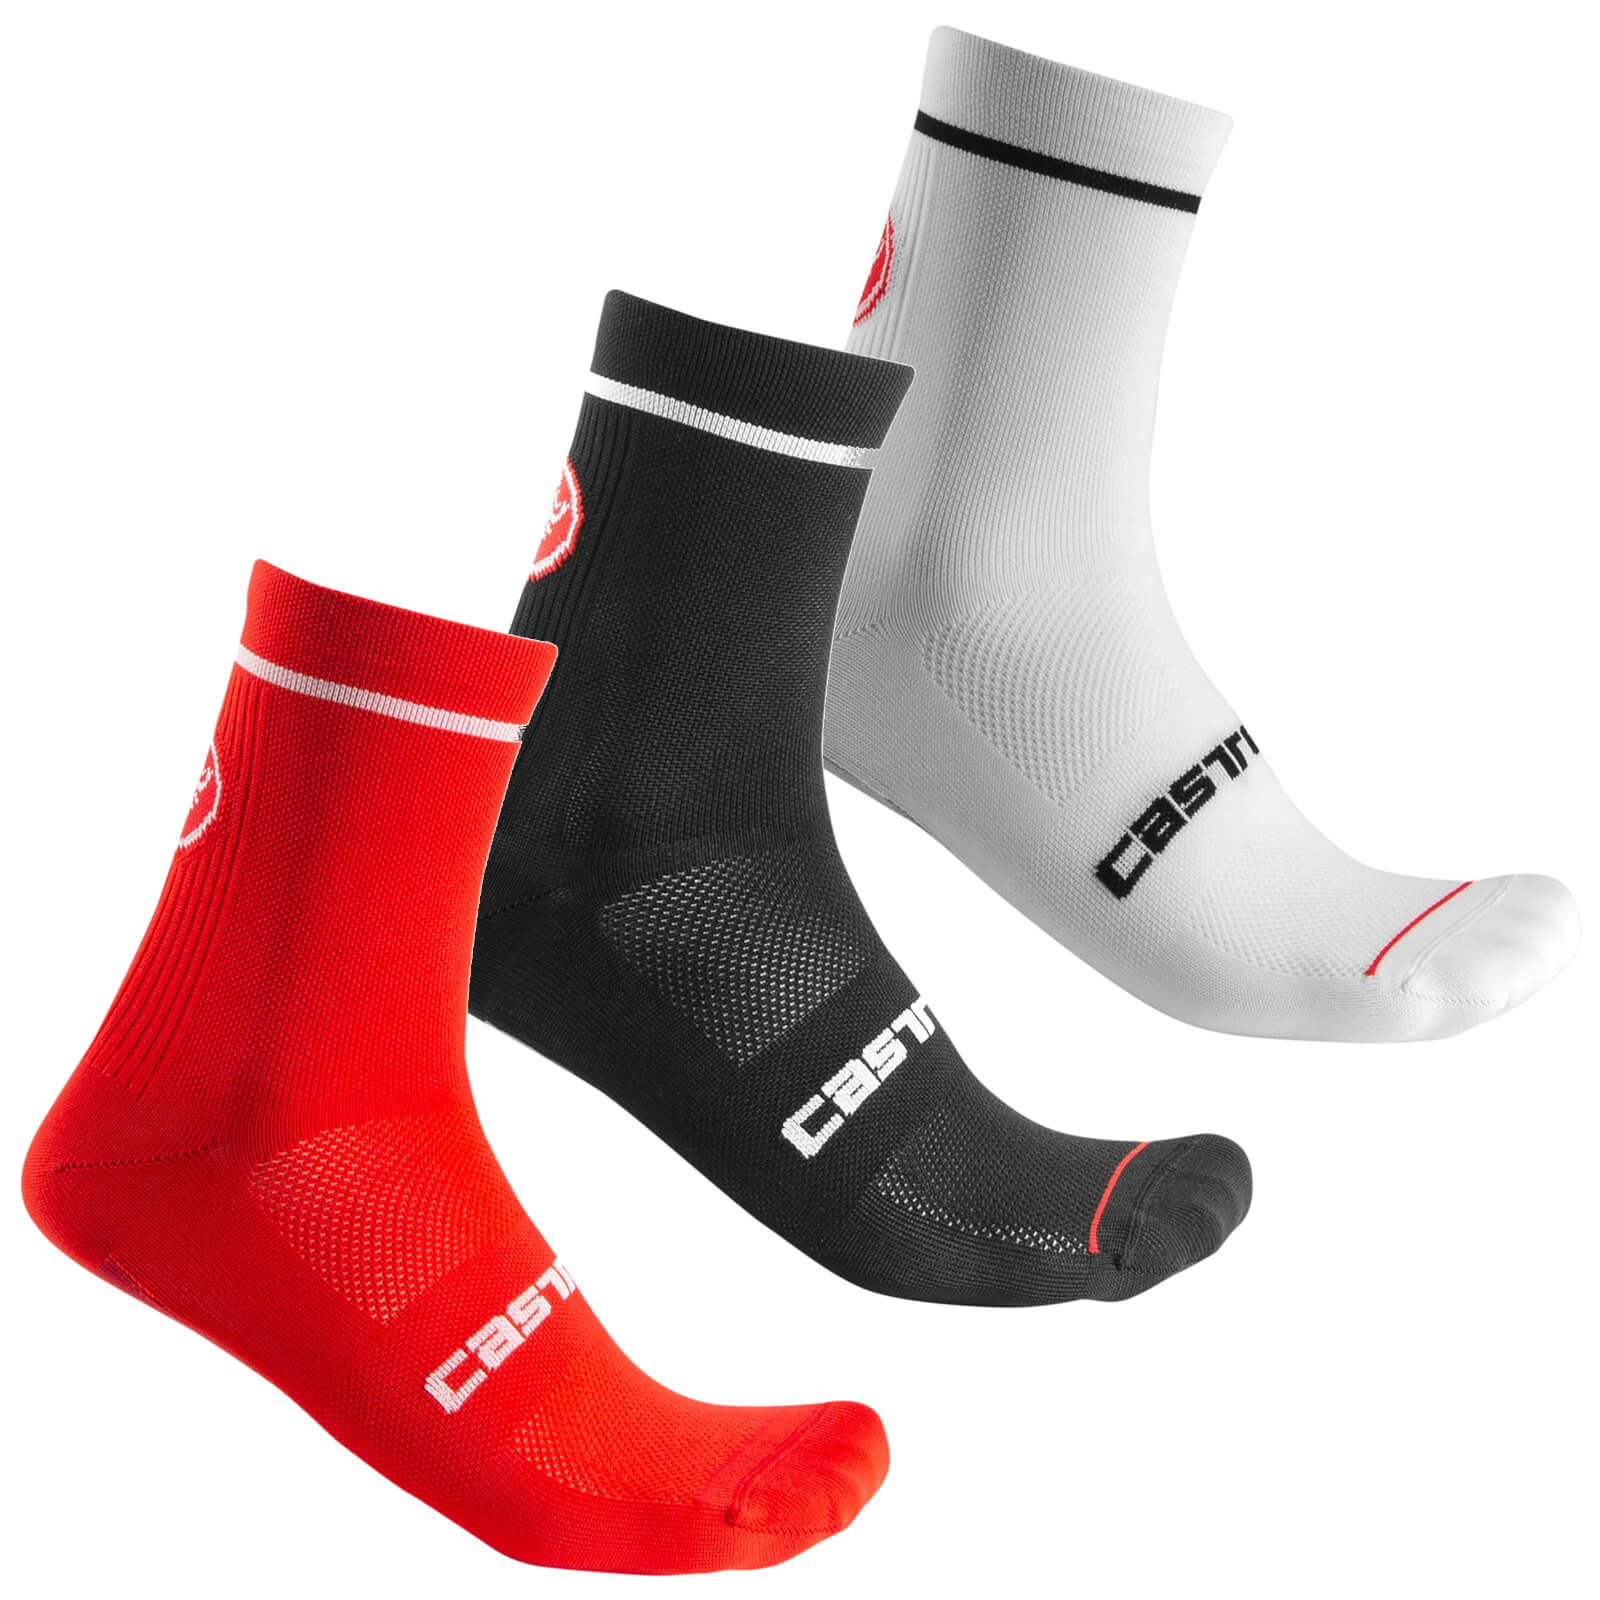 Castelli Entrata 9 Socks - L/XL - Schwarz